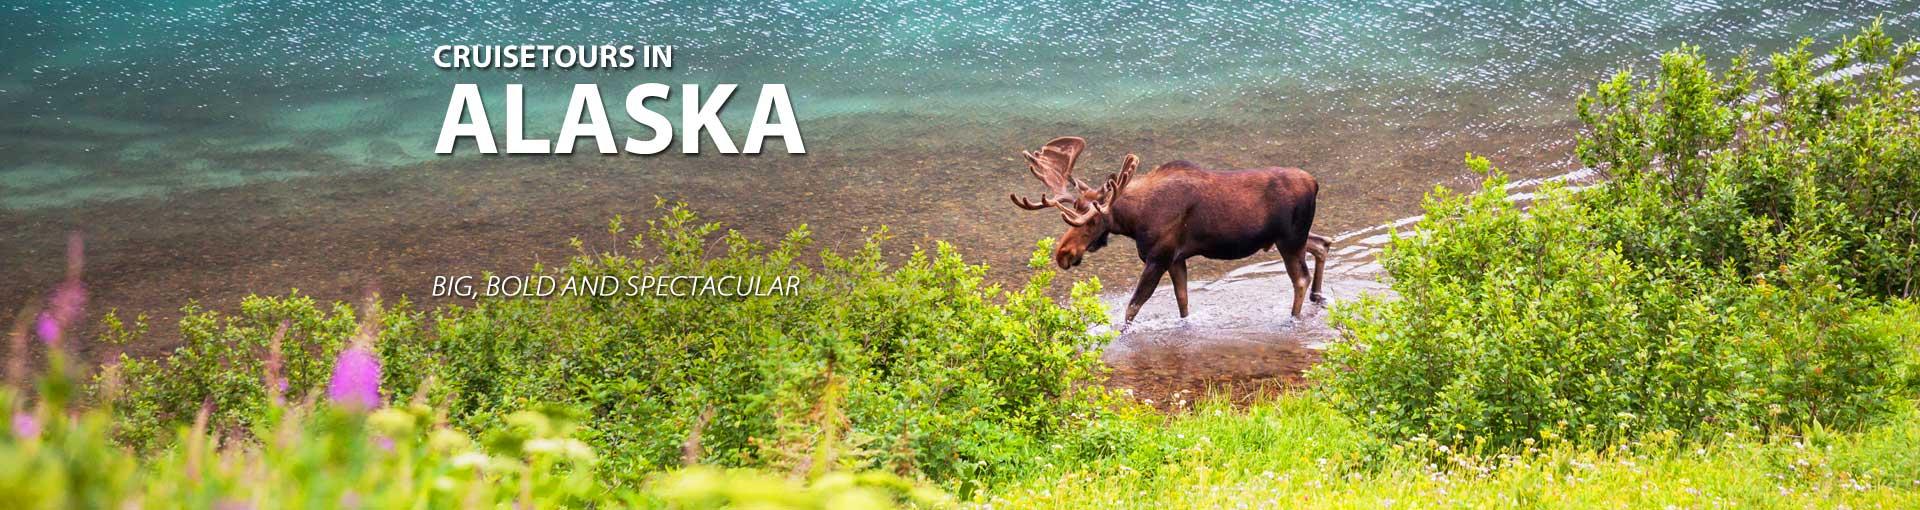 Alaska Cruisetours Cruises